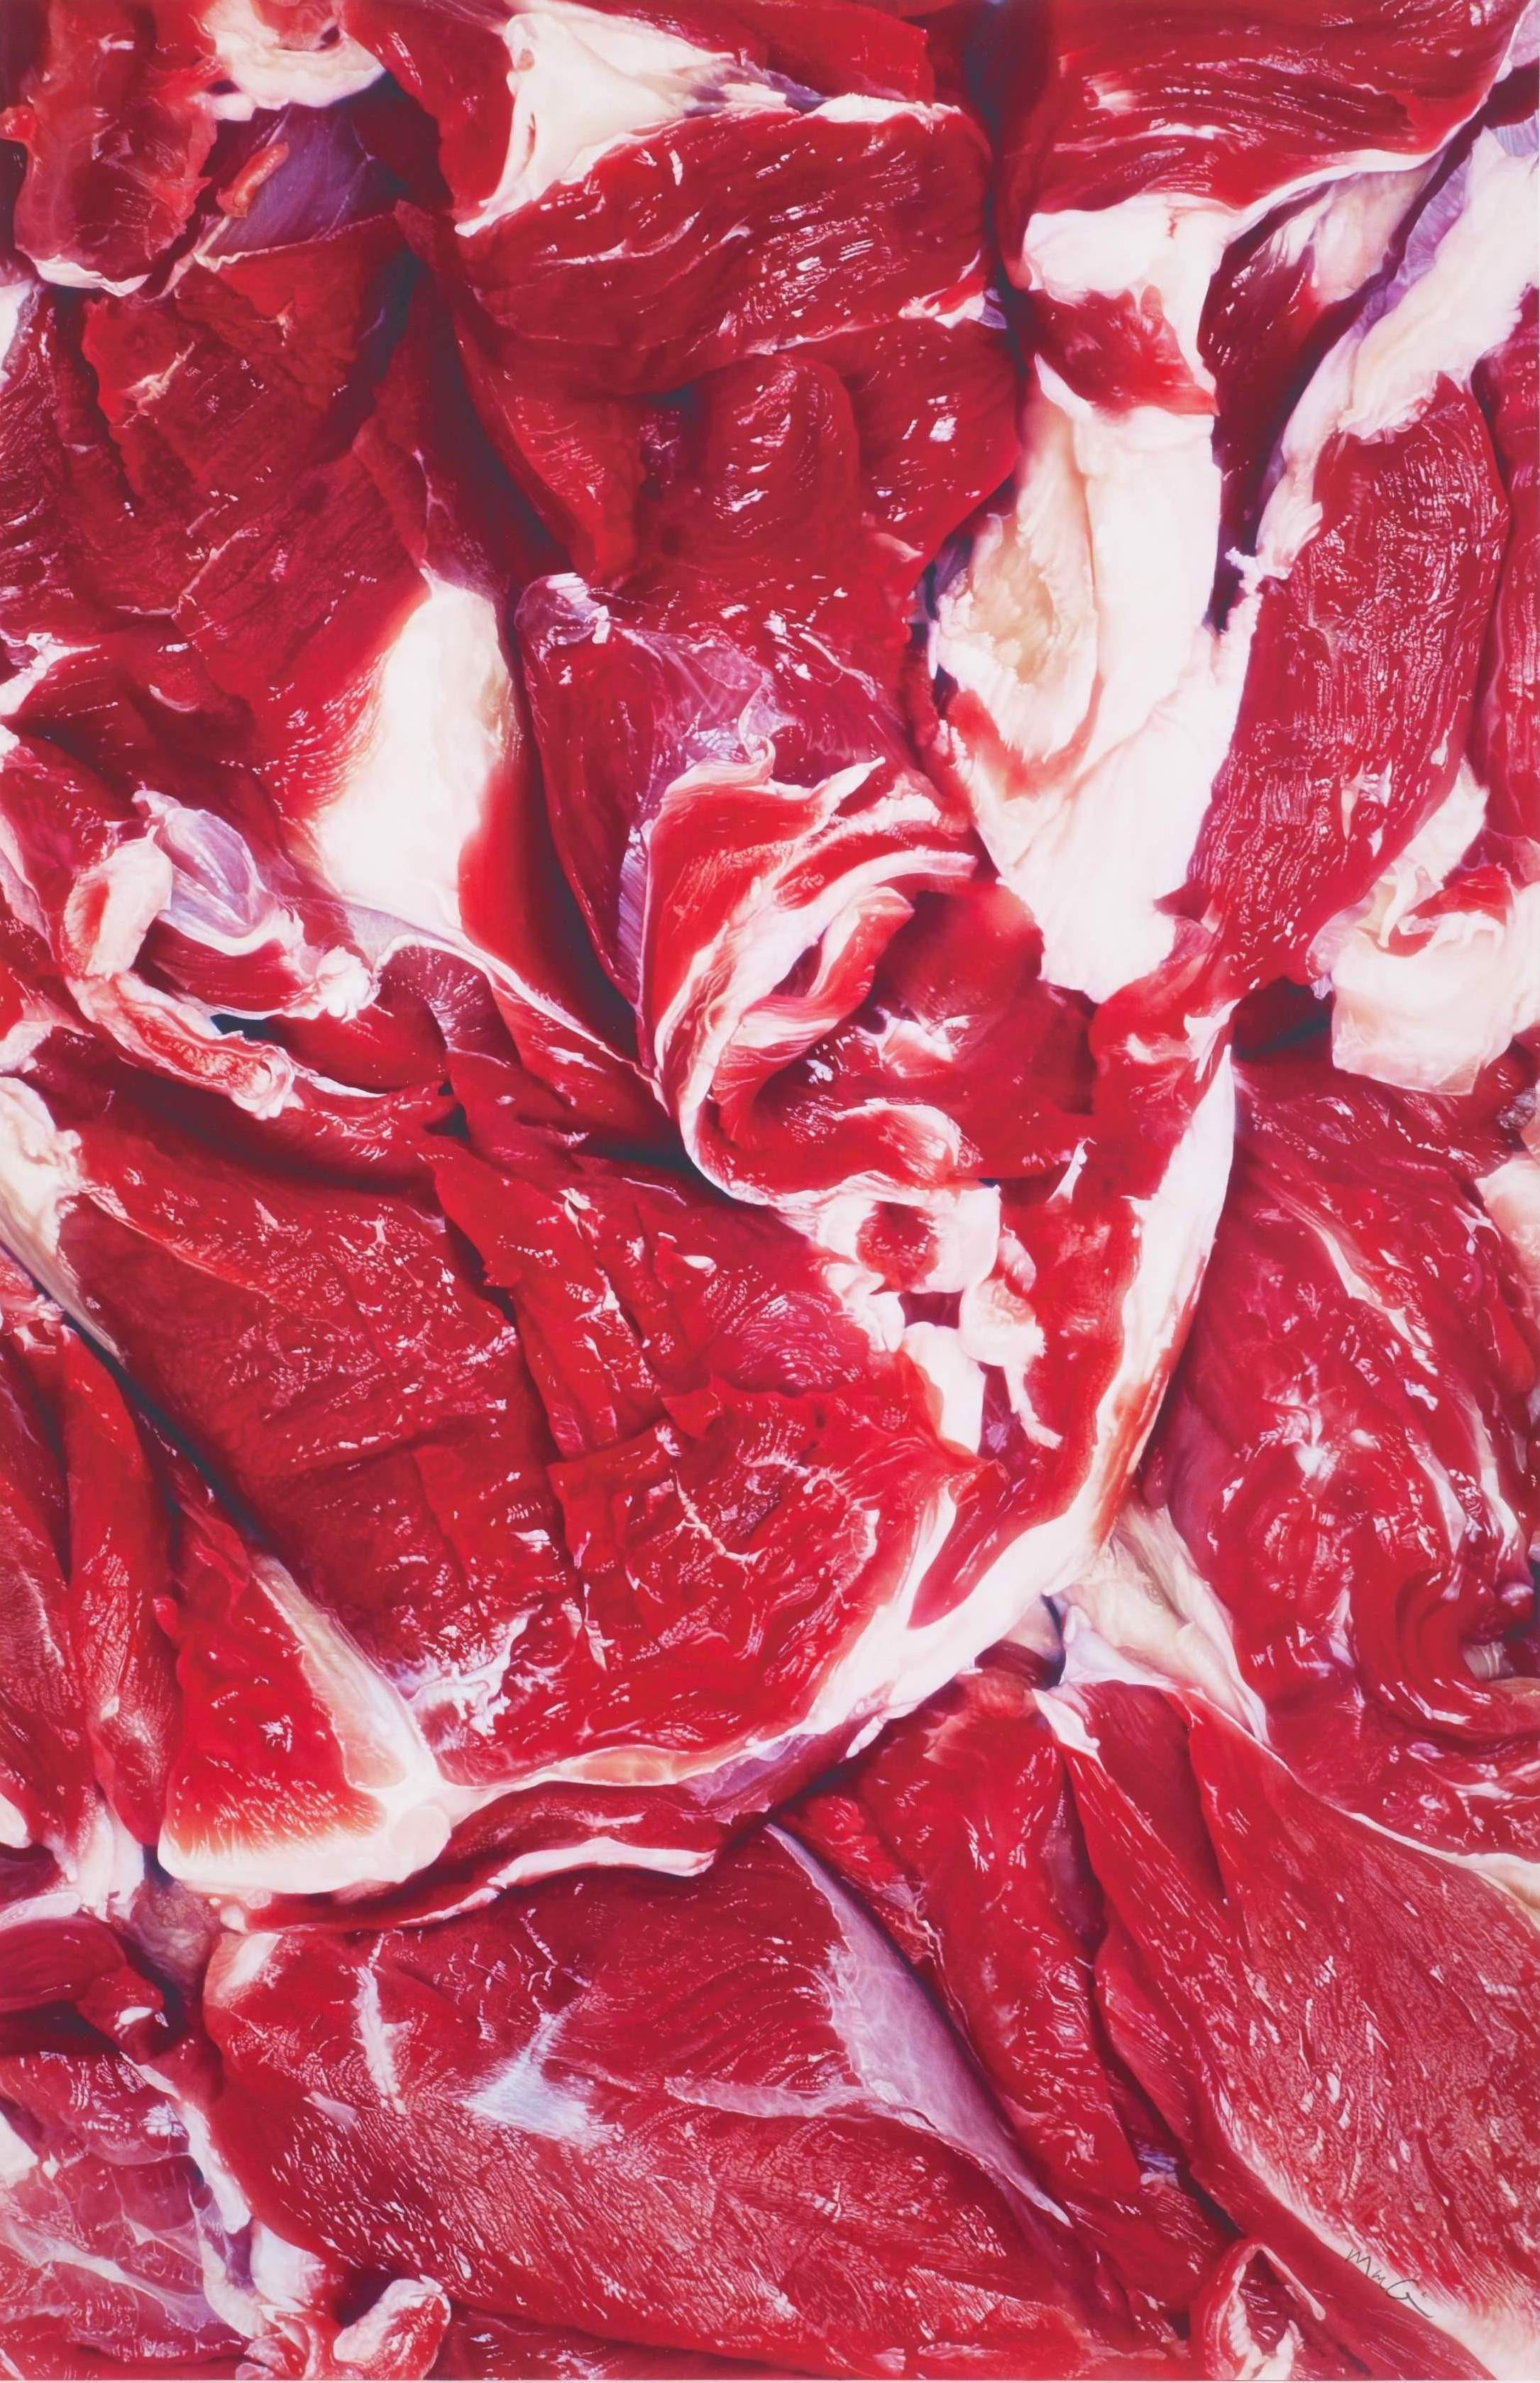 On Vegetarianism